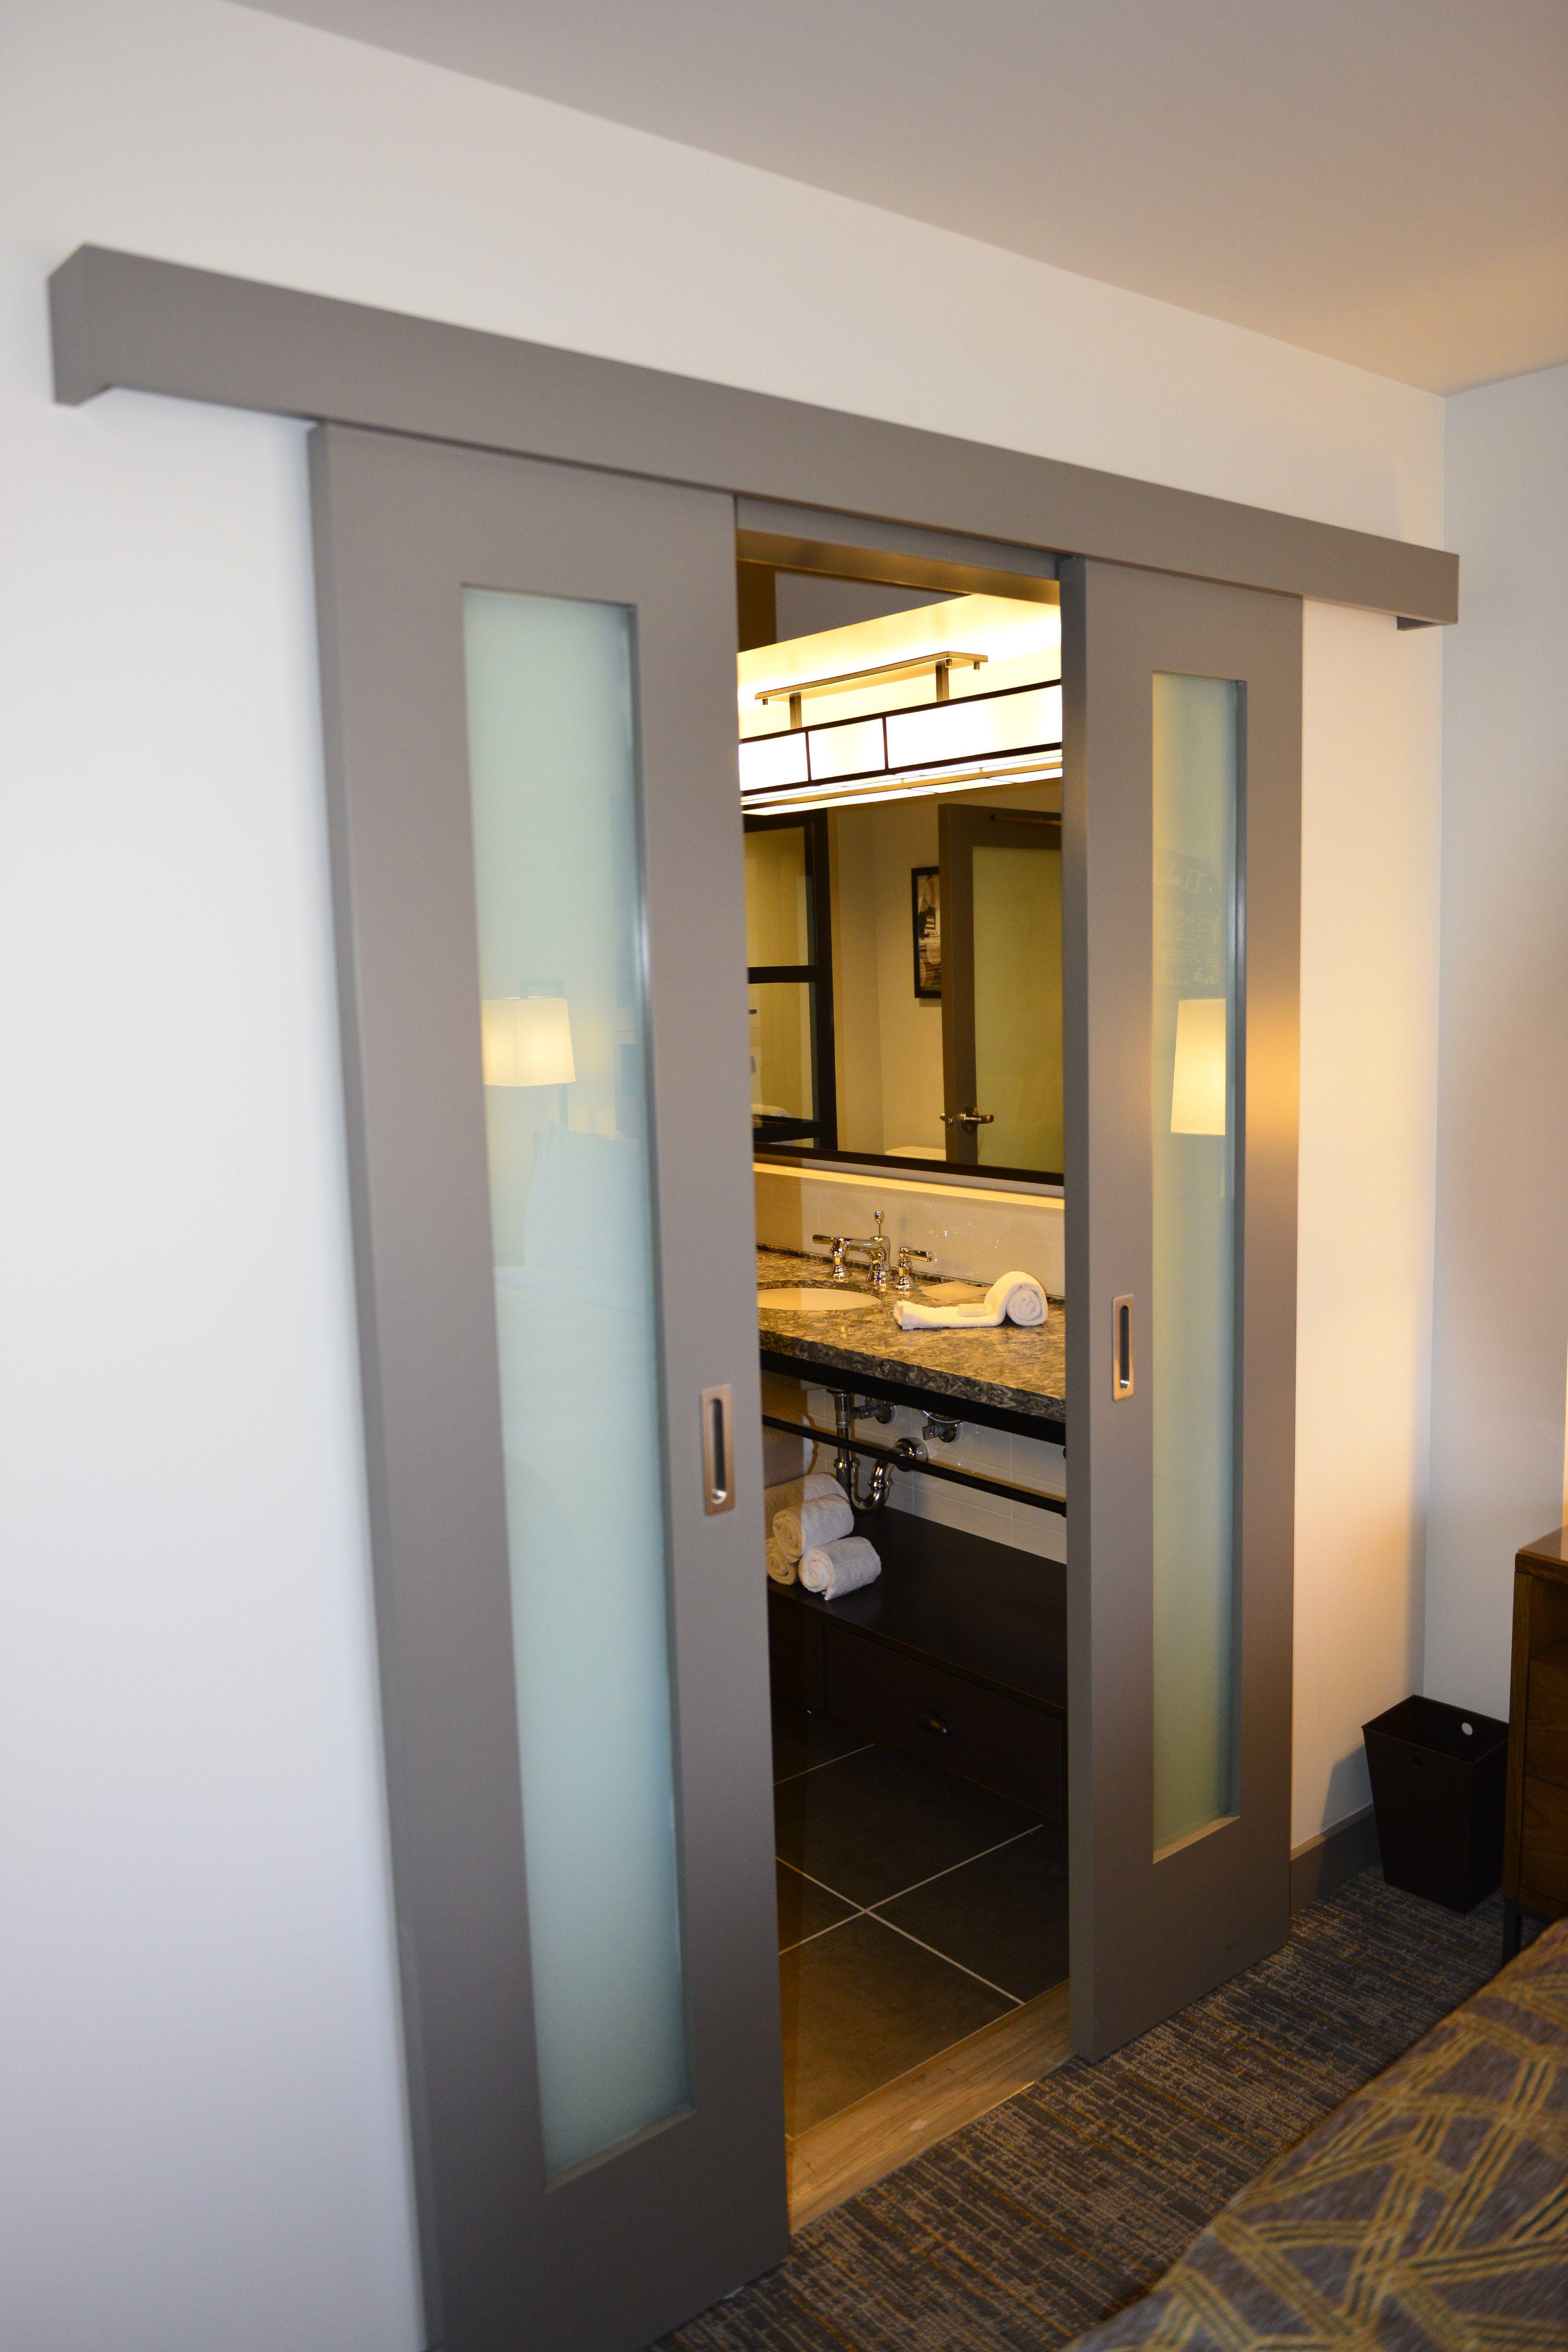 Dsi Slim Line Wall Slider Stile & Rail Doors With